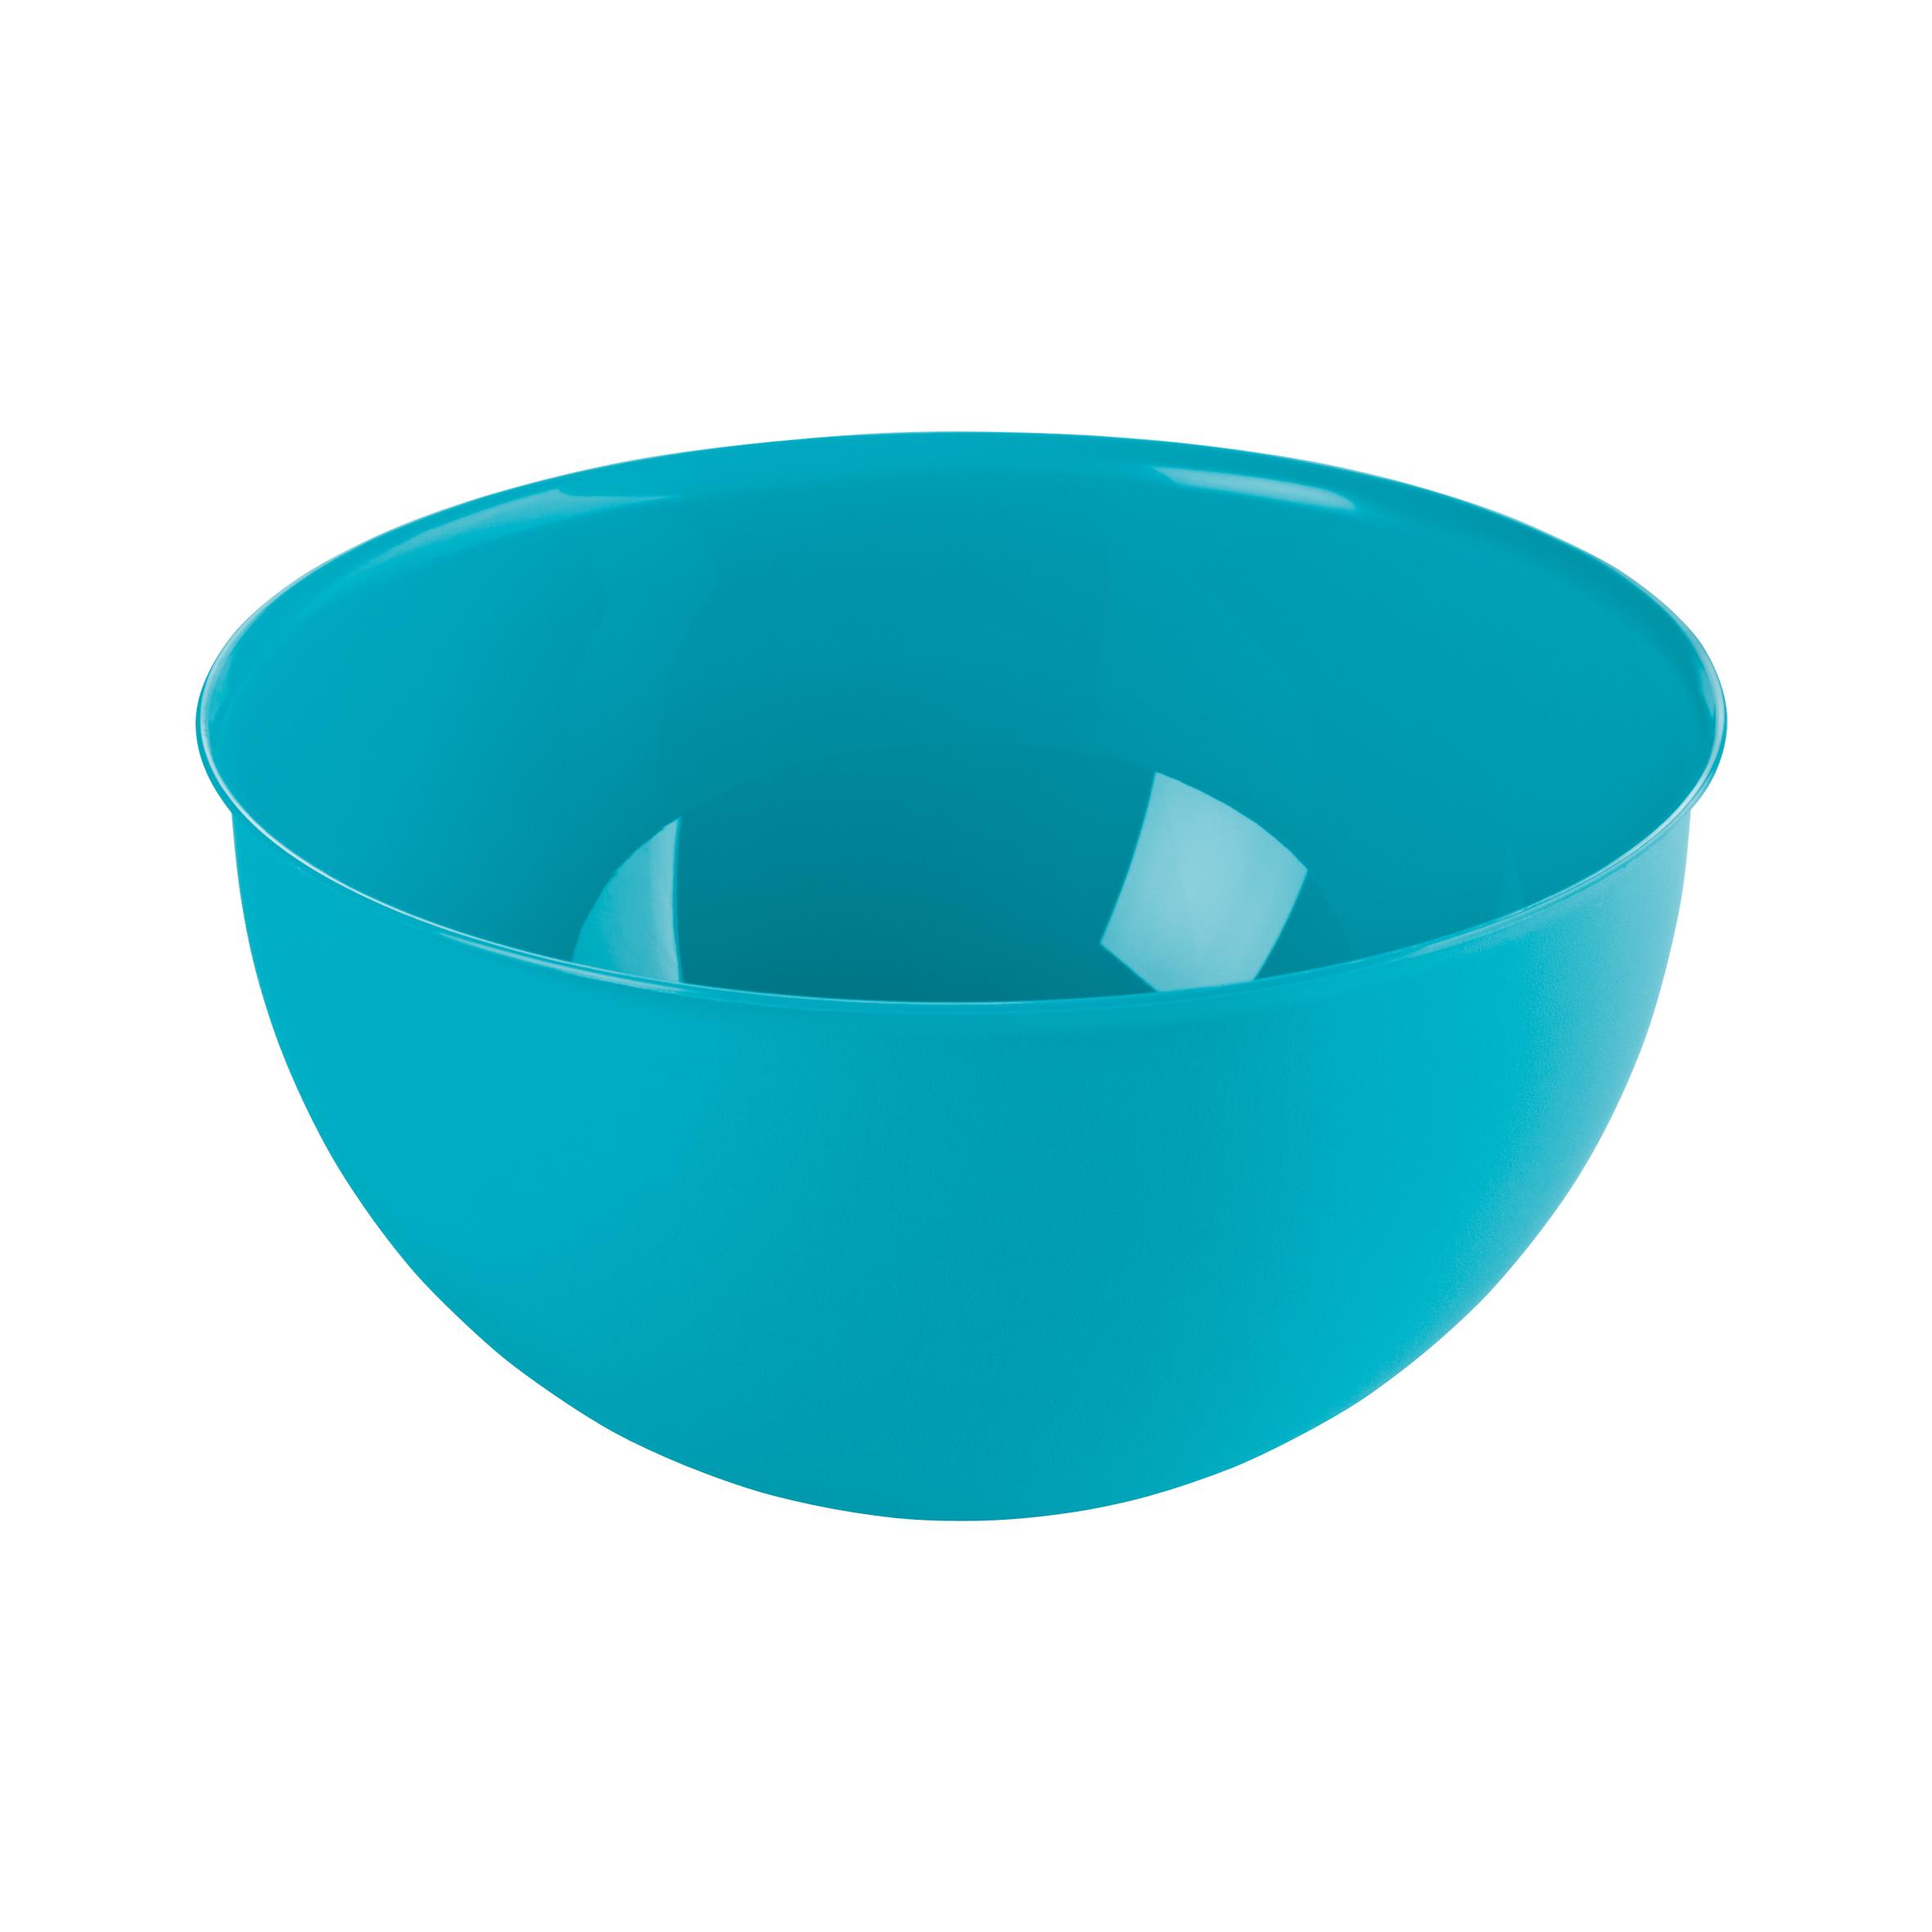 Home accessories koziolshopuk koziol. Bowl clipart blue bowl